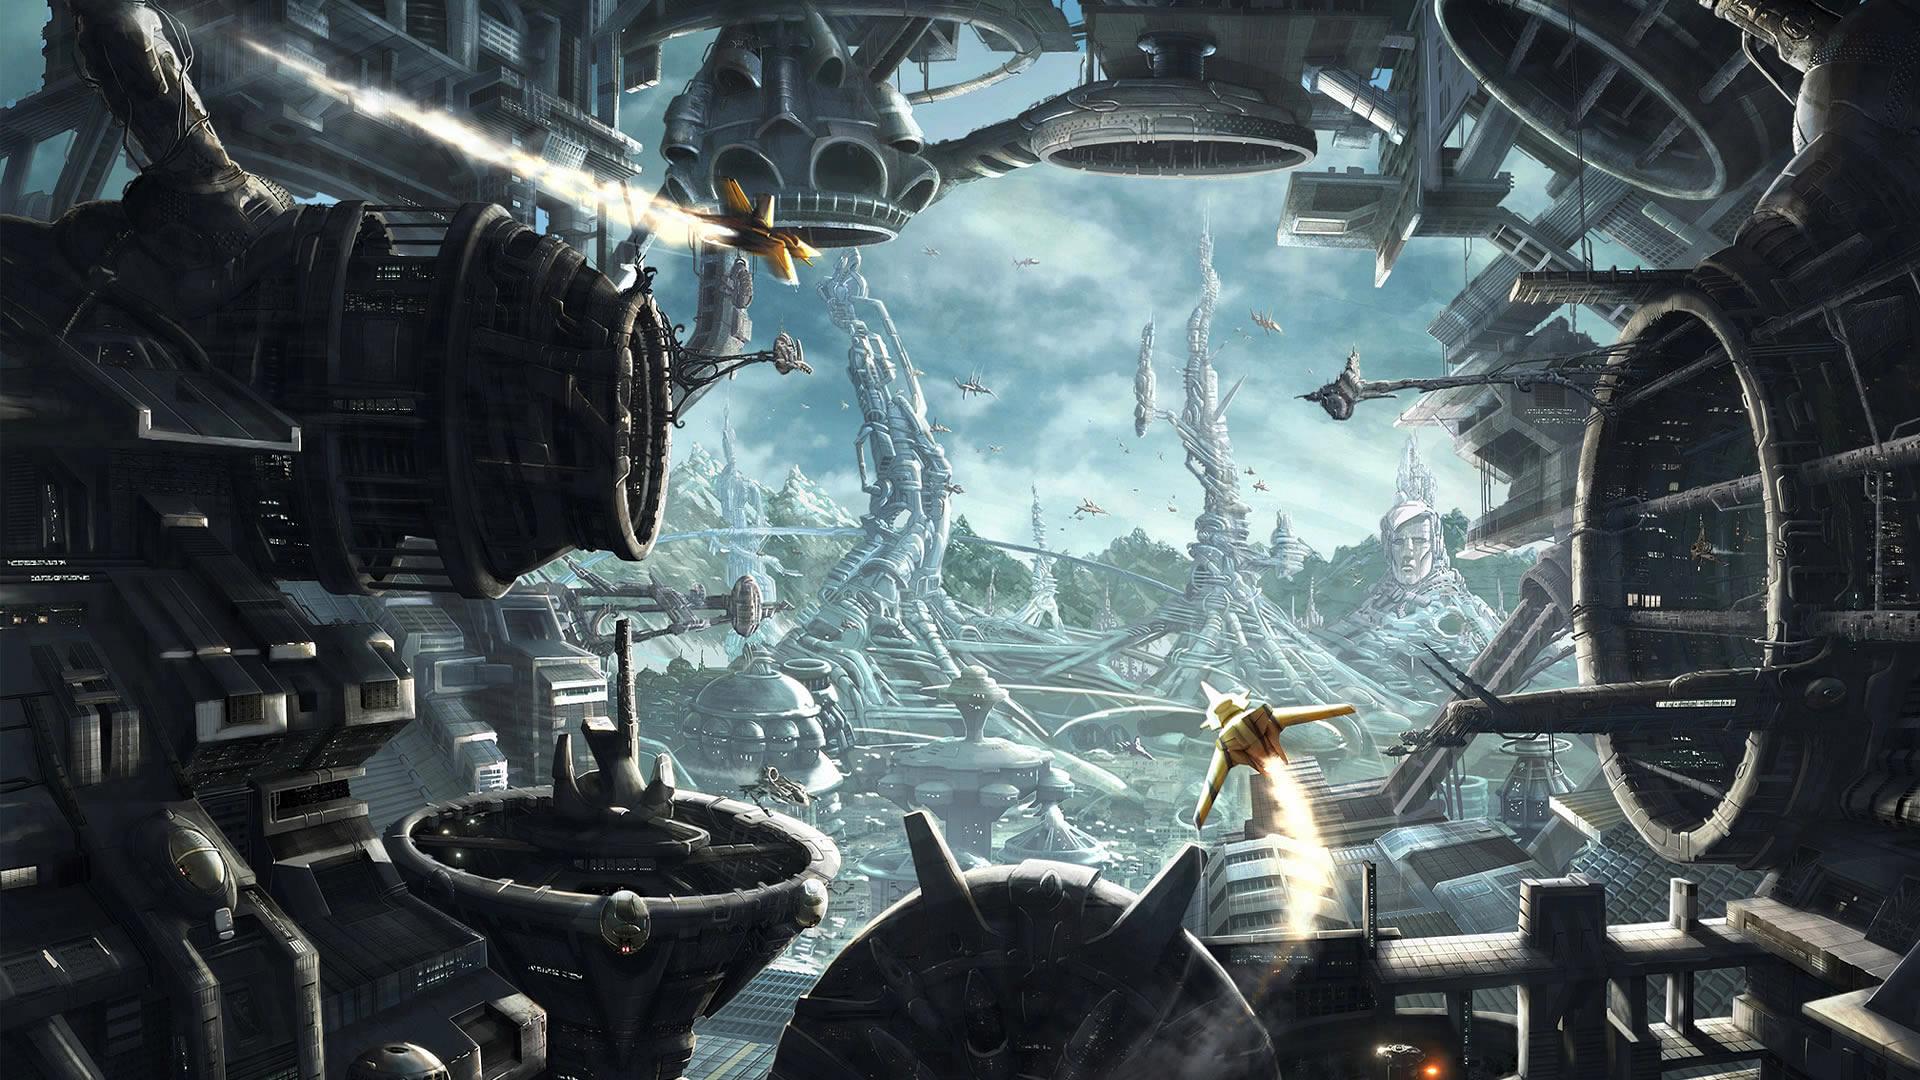 Sci Fi Spacecraft Art Sci fi wallpaper of the week 9 1920x1080